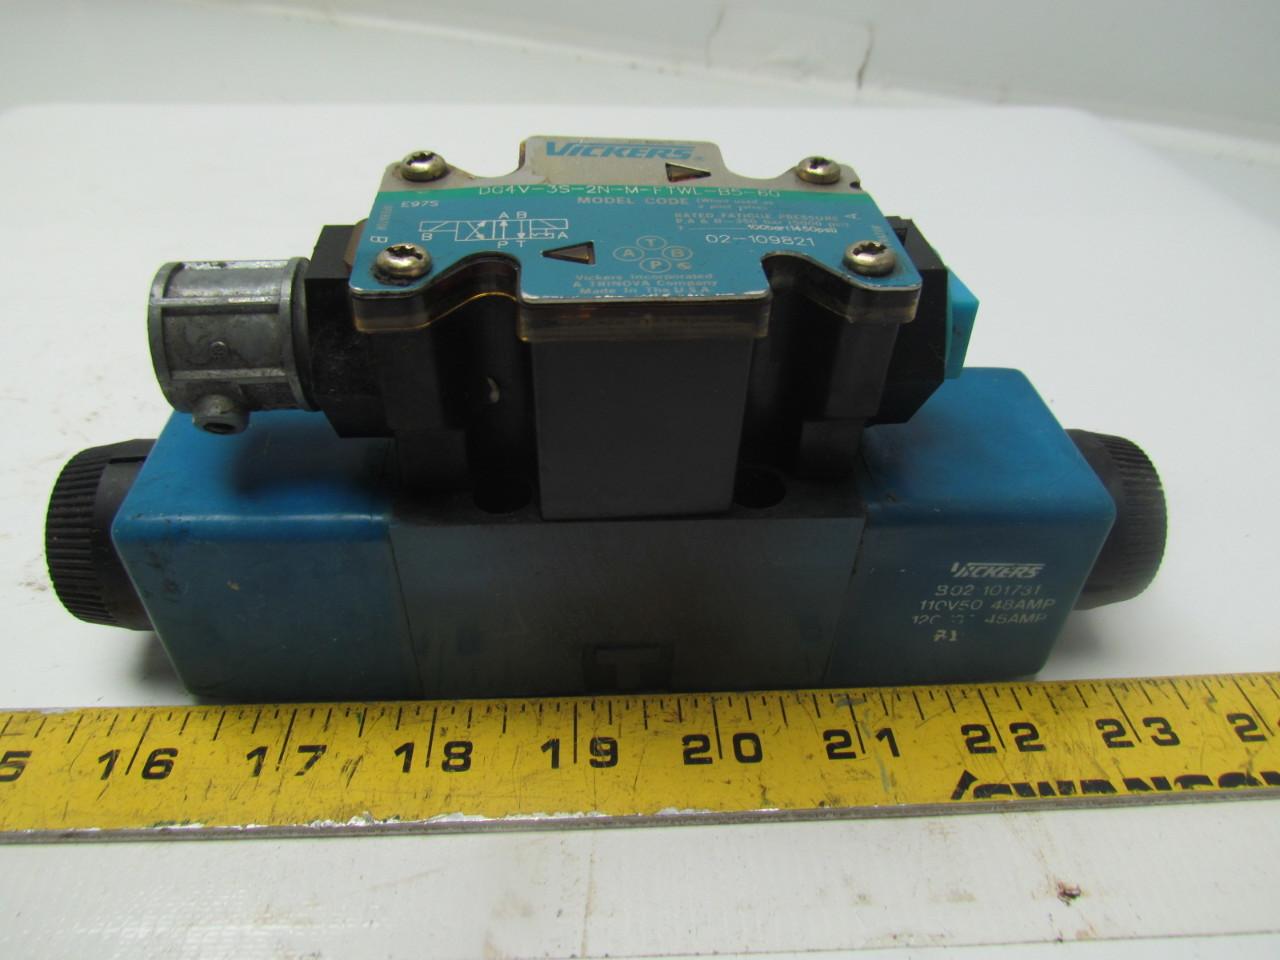 Vickers DG4V-3S-2N-M-FTWL-B5-60 120V Reversible Hydraulic Control Valve Size D03